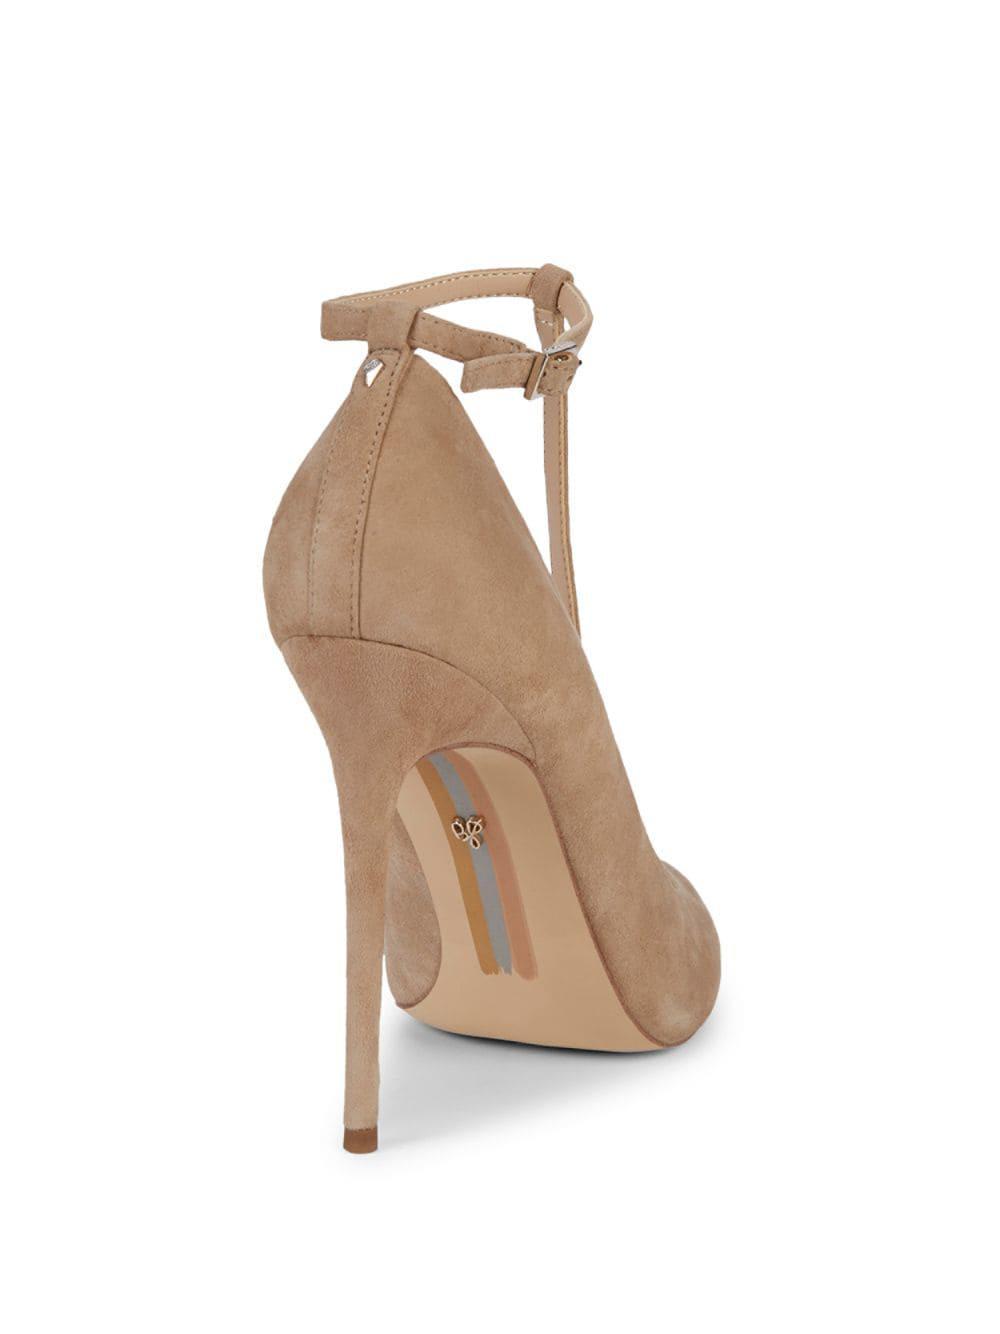 f5c5d2434 Lyst - Sam Edelman Dorinda Ankle-strap Suede Stiletto Pumps in Natural